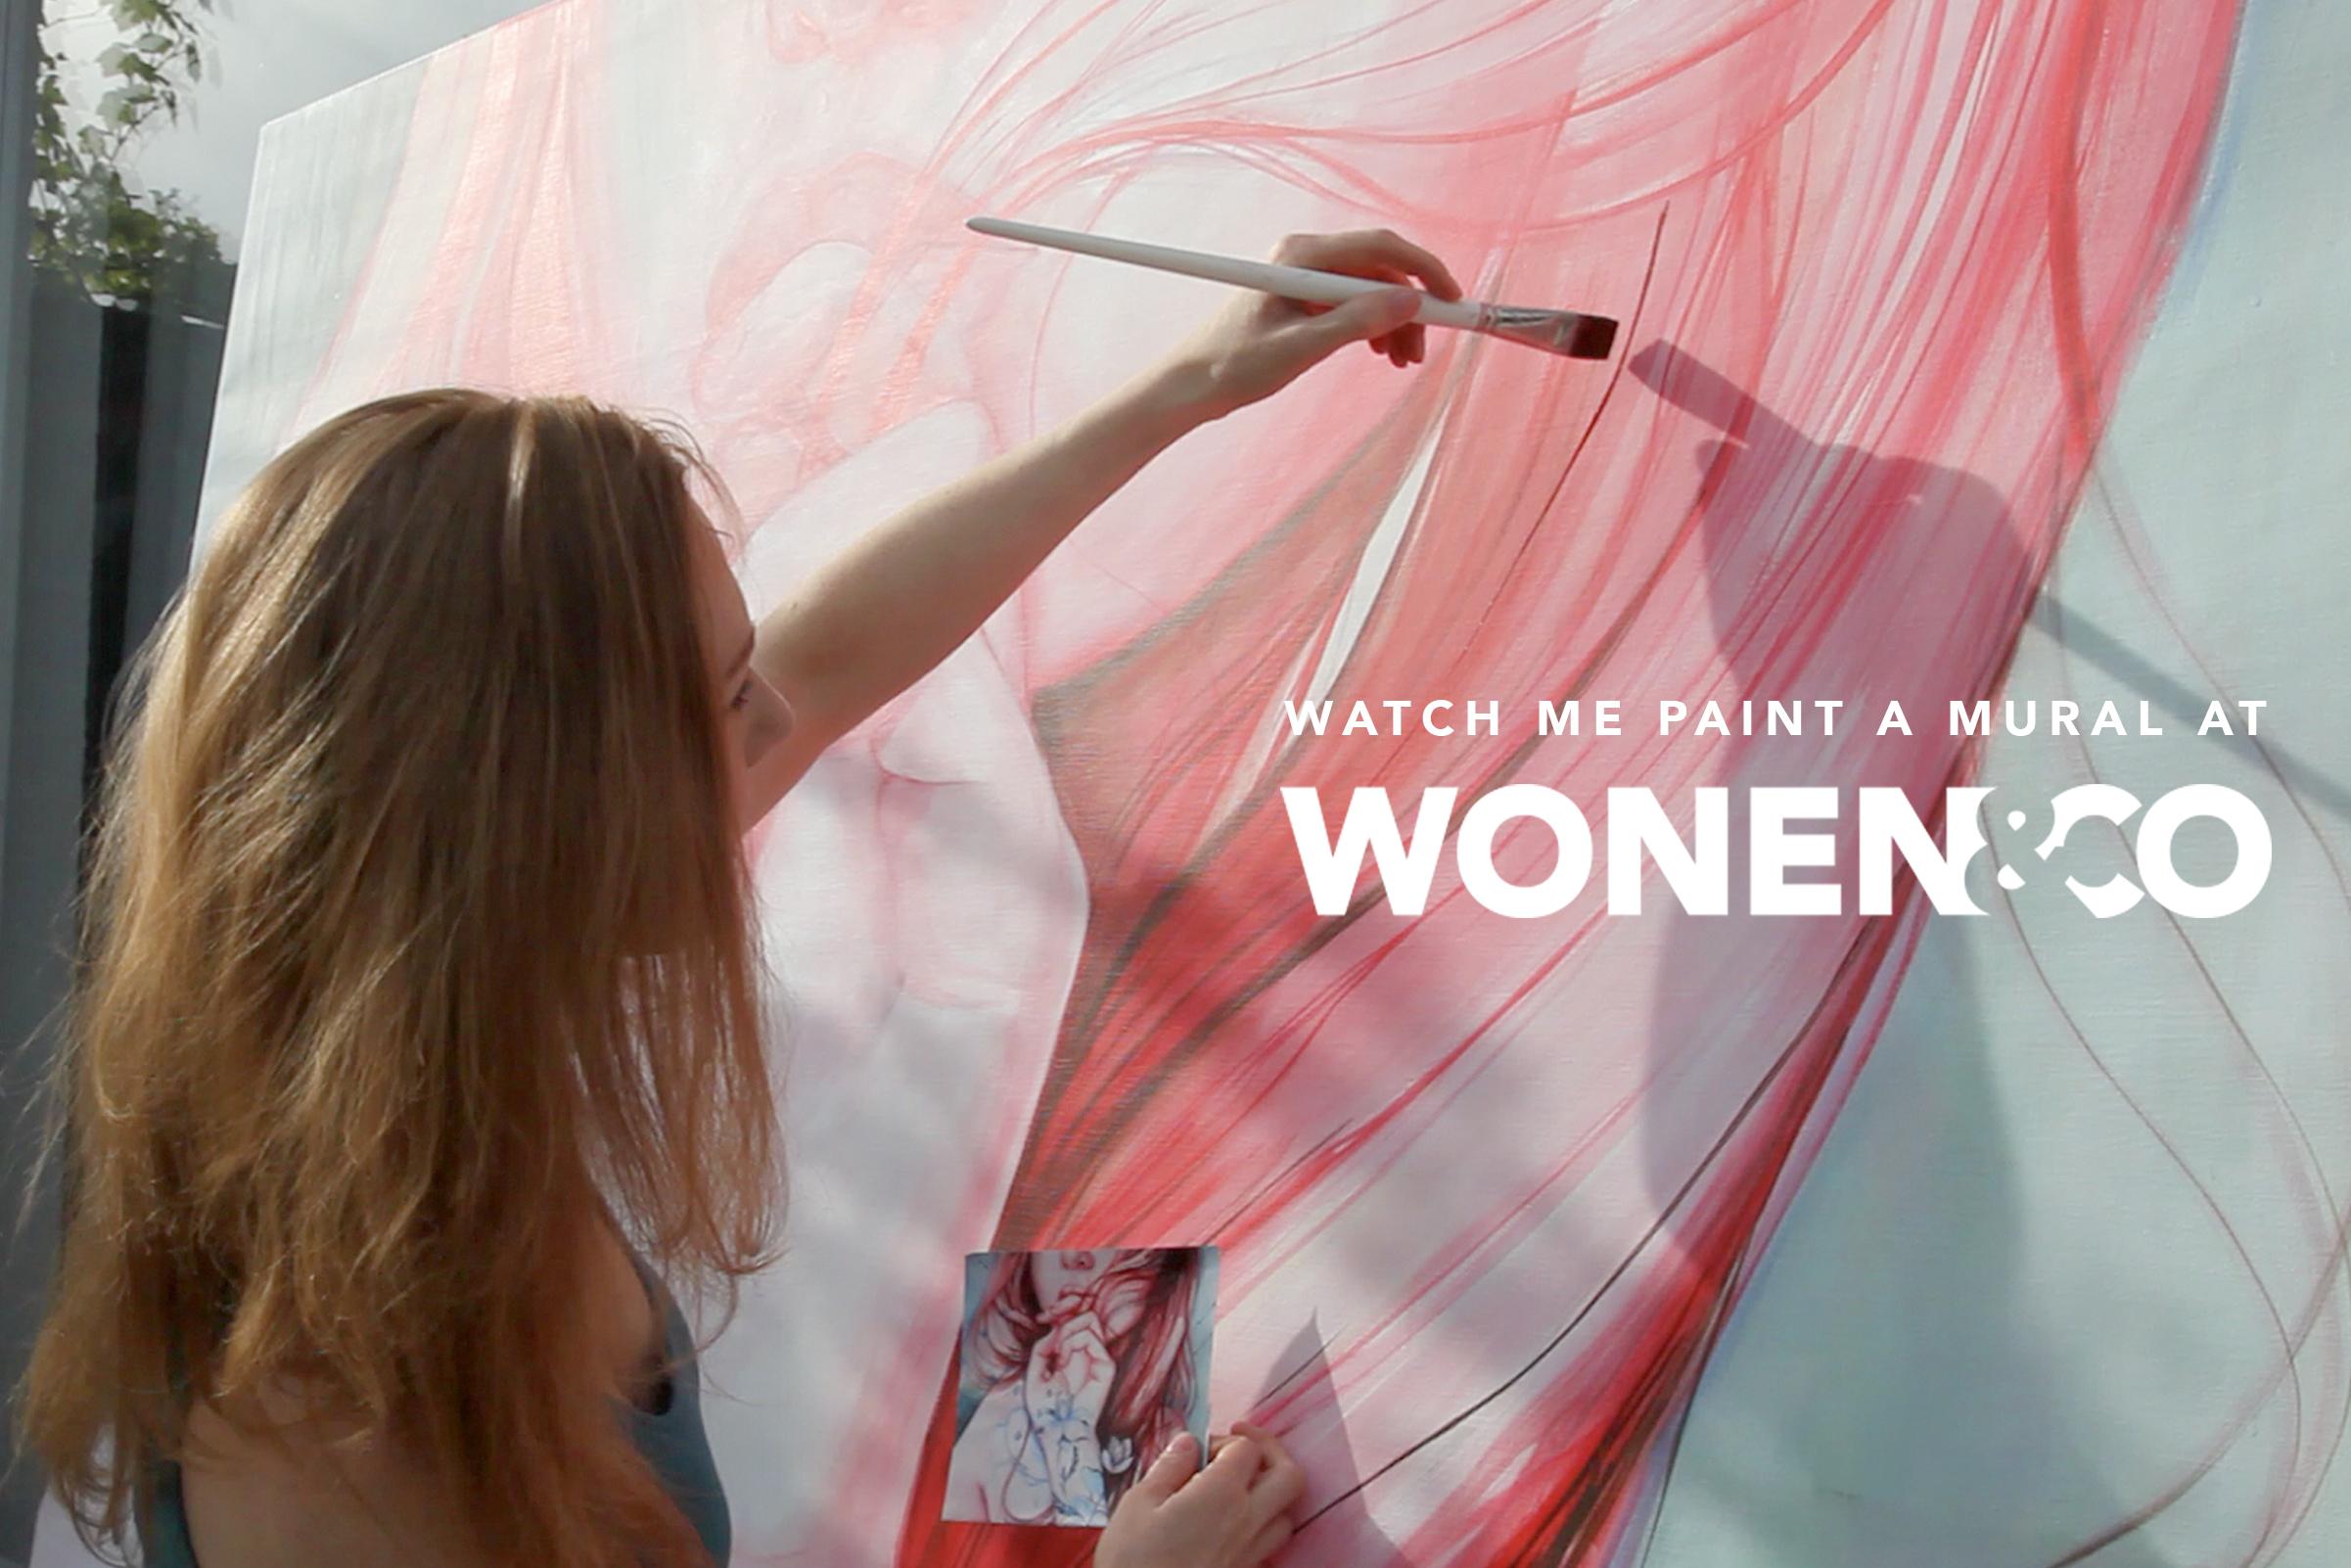 Painting_Mural_Wonen&Co_Marjolein_Caljouw_blog_thumb.jpg